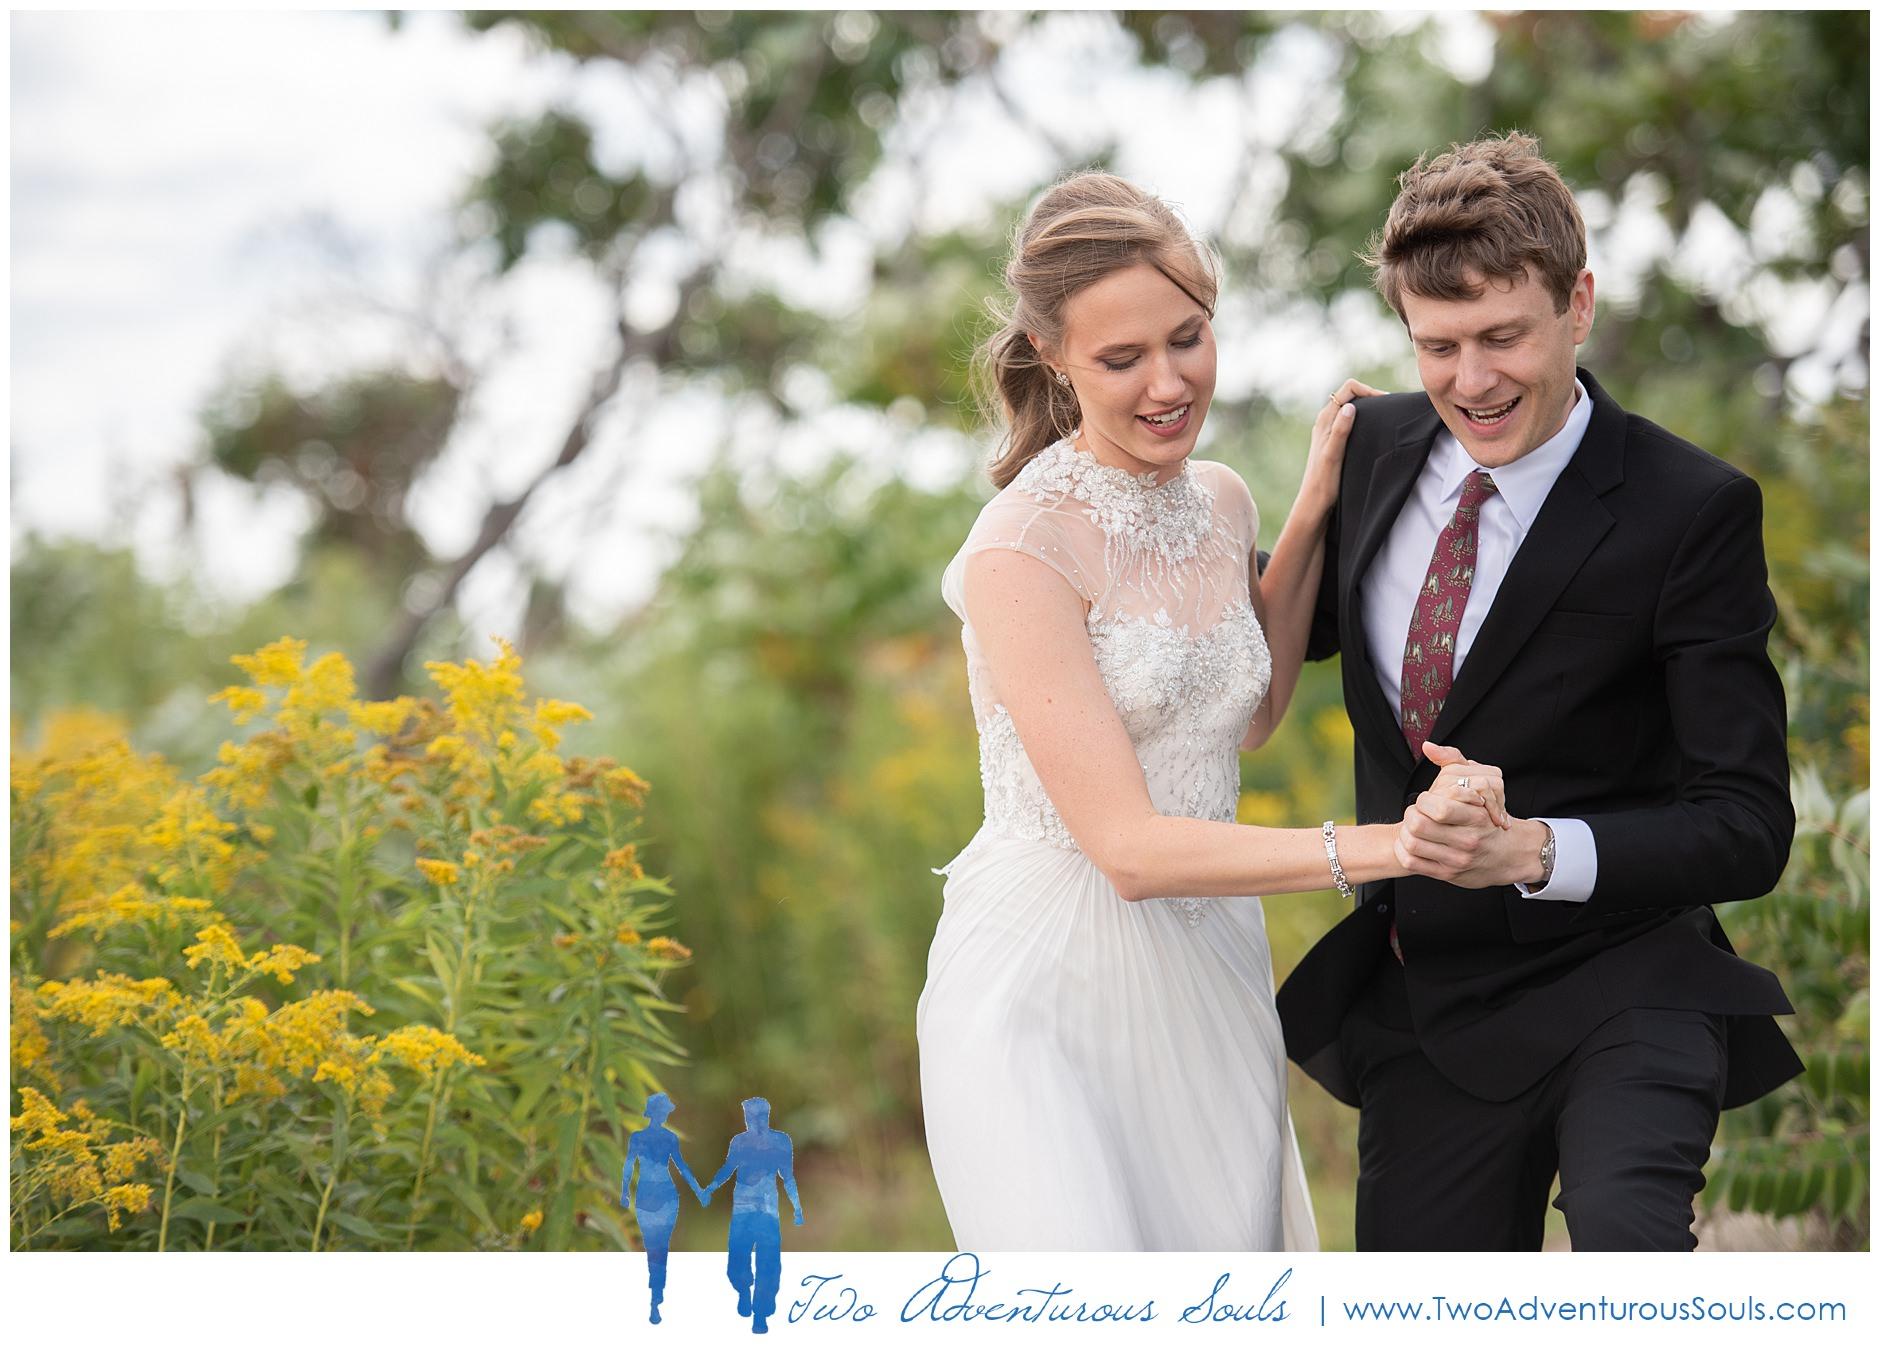 Grace Maine Photographers, Portland Maine Wedding Photographers, Two Adventurous Souls- 090719_0008.jpg